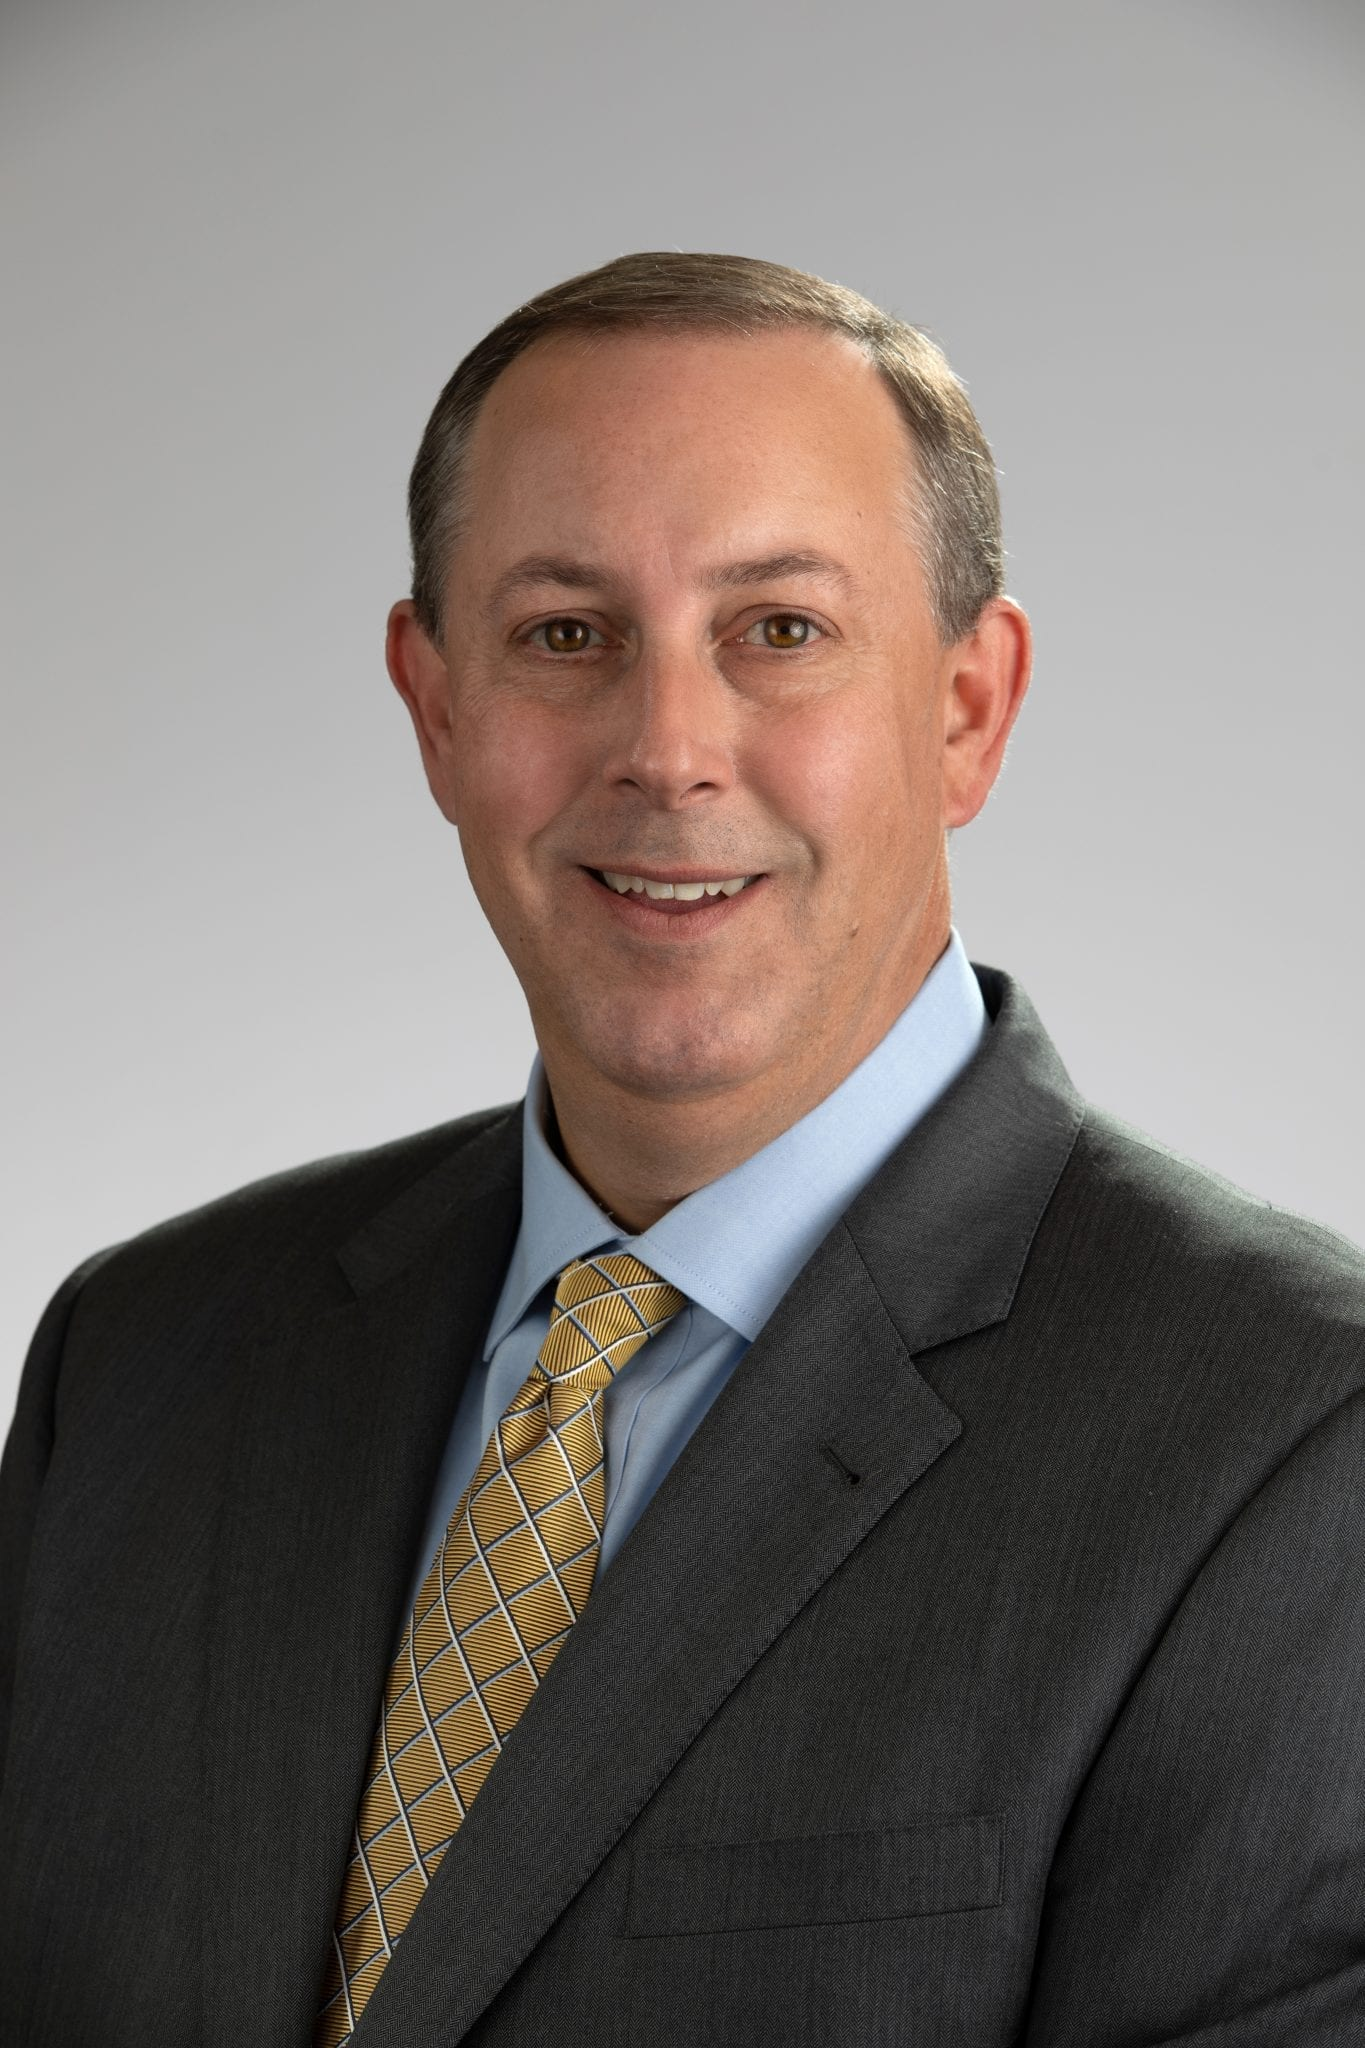 Peter R. Florek, CLTC